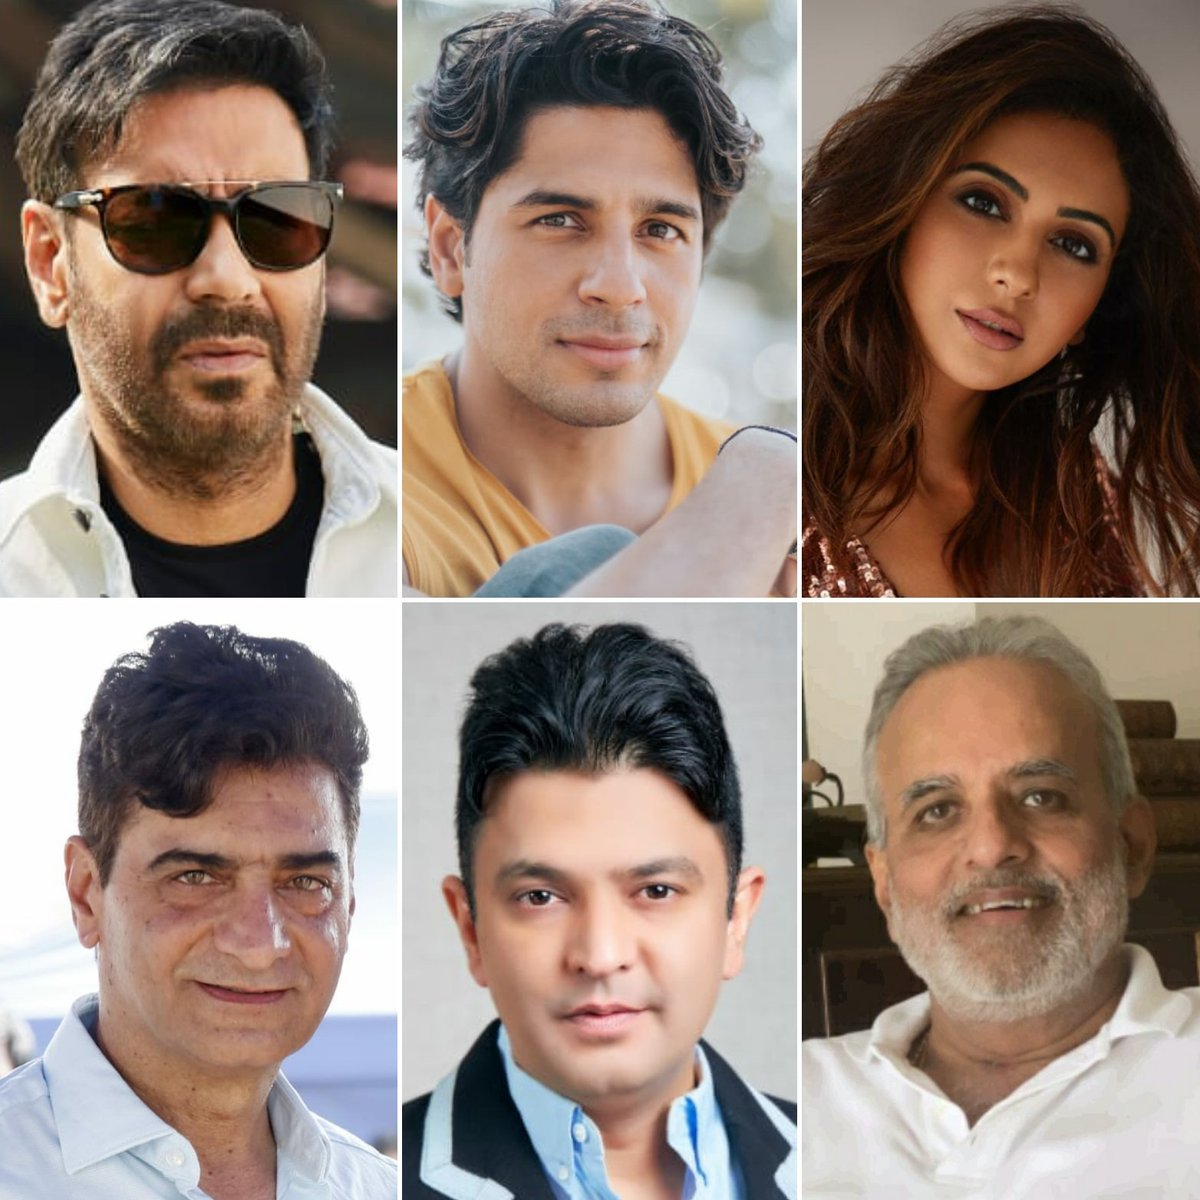 ANNOUNCEMENT ALERT!🤯🔥   #ThankGod: a slice of life comedy starring @ajaydevgn @SidMalhotra @Rakulpreet is set to go on floors from 21st January 2021!! Good luck 🤗  #Sidk @Indra_kumar_9 #BhushanKumar #KrishanKumar #AshokThakeria @SunirKheterpal @DeepakMukut